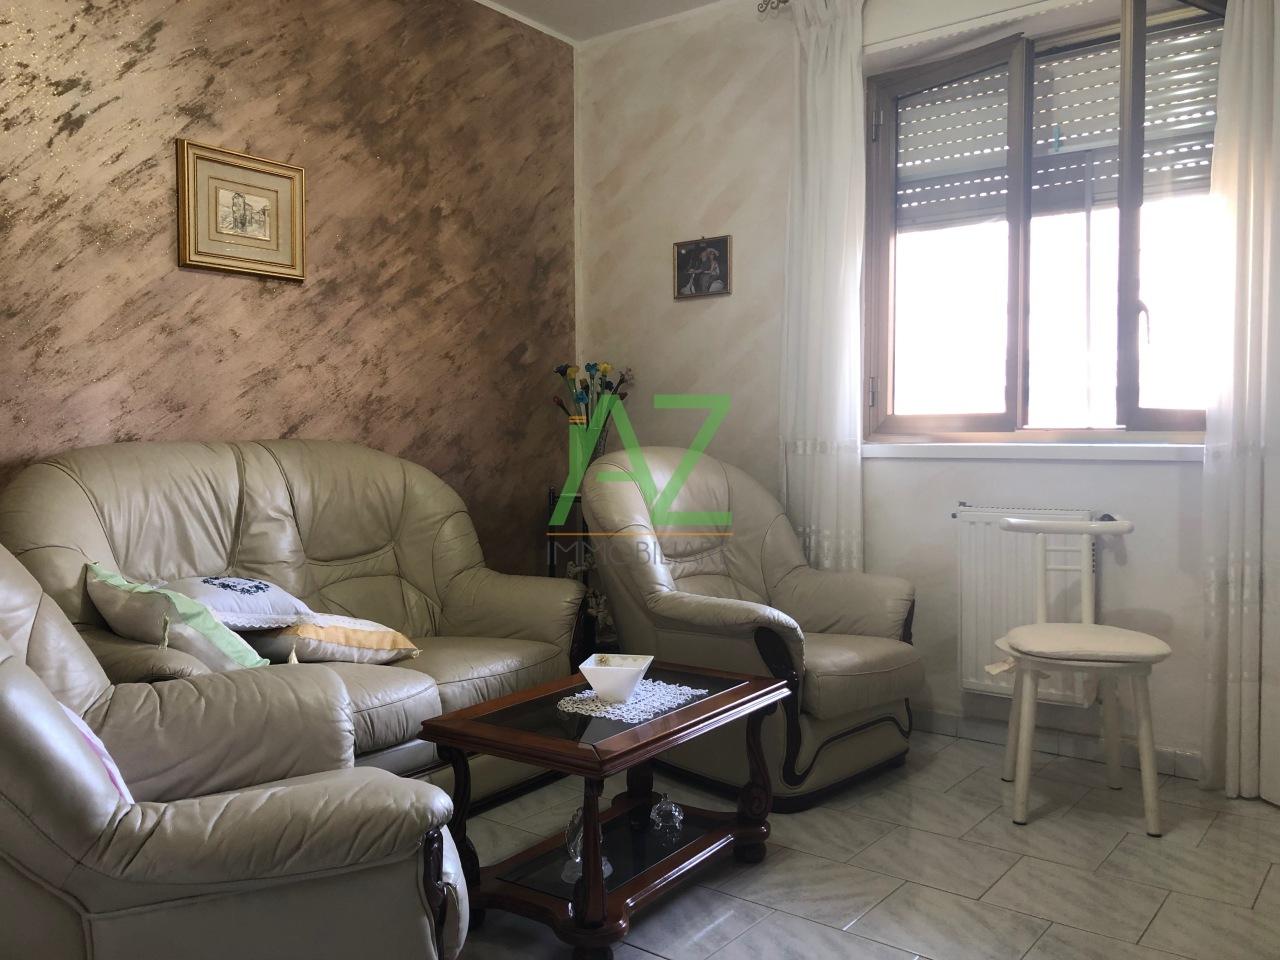 Appartamento a Librino, Catania